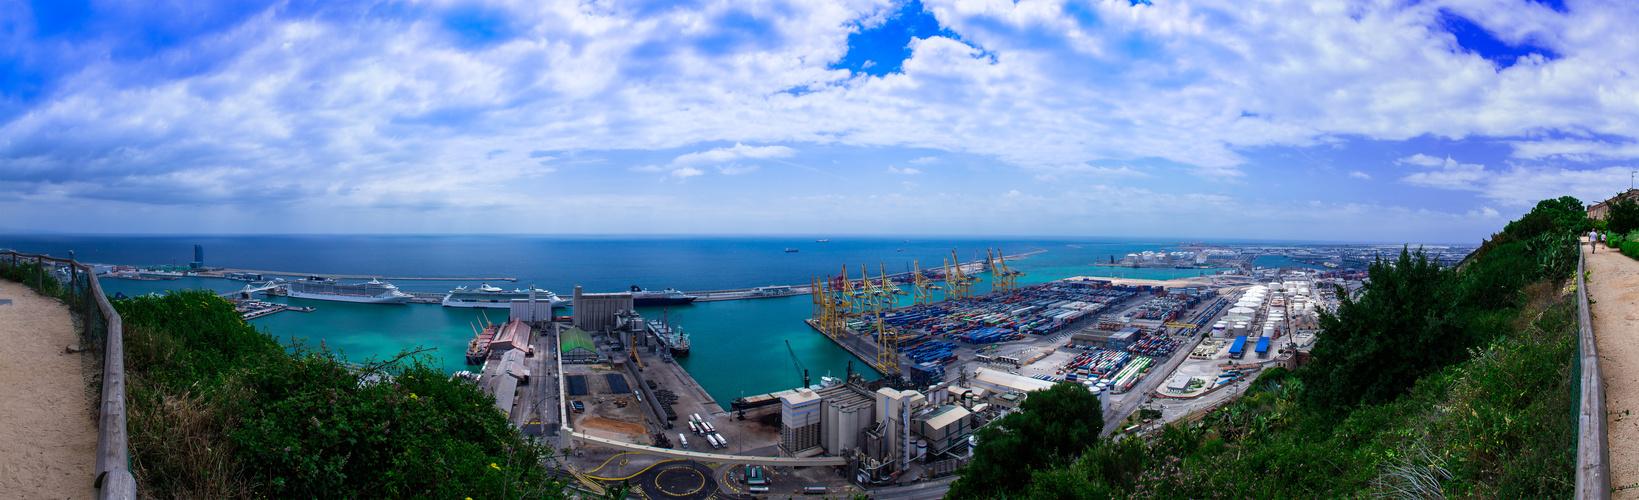 Containerhafen Barcelona